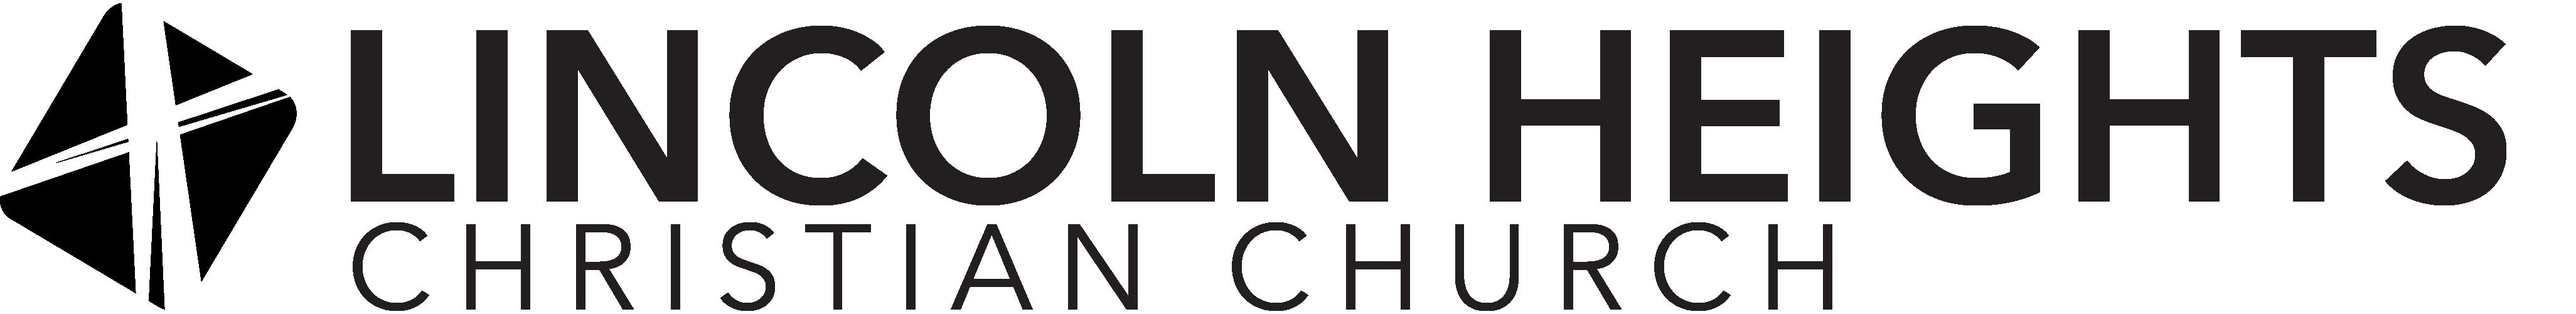 Lincoln Heights Christian Church in Phoenix